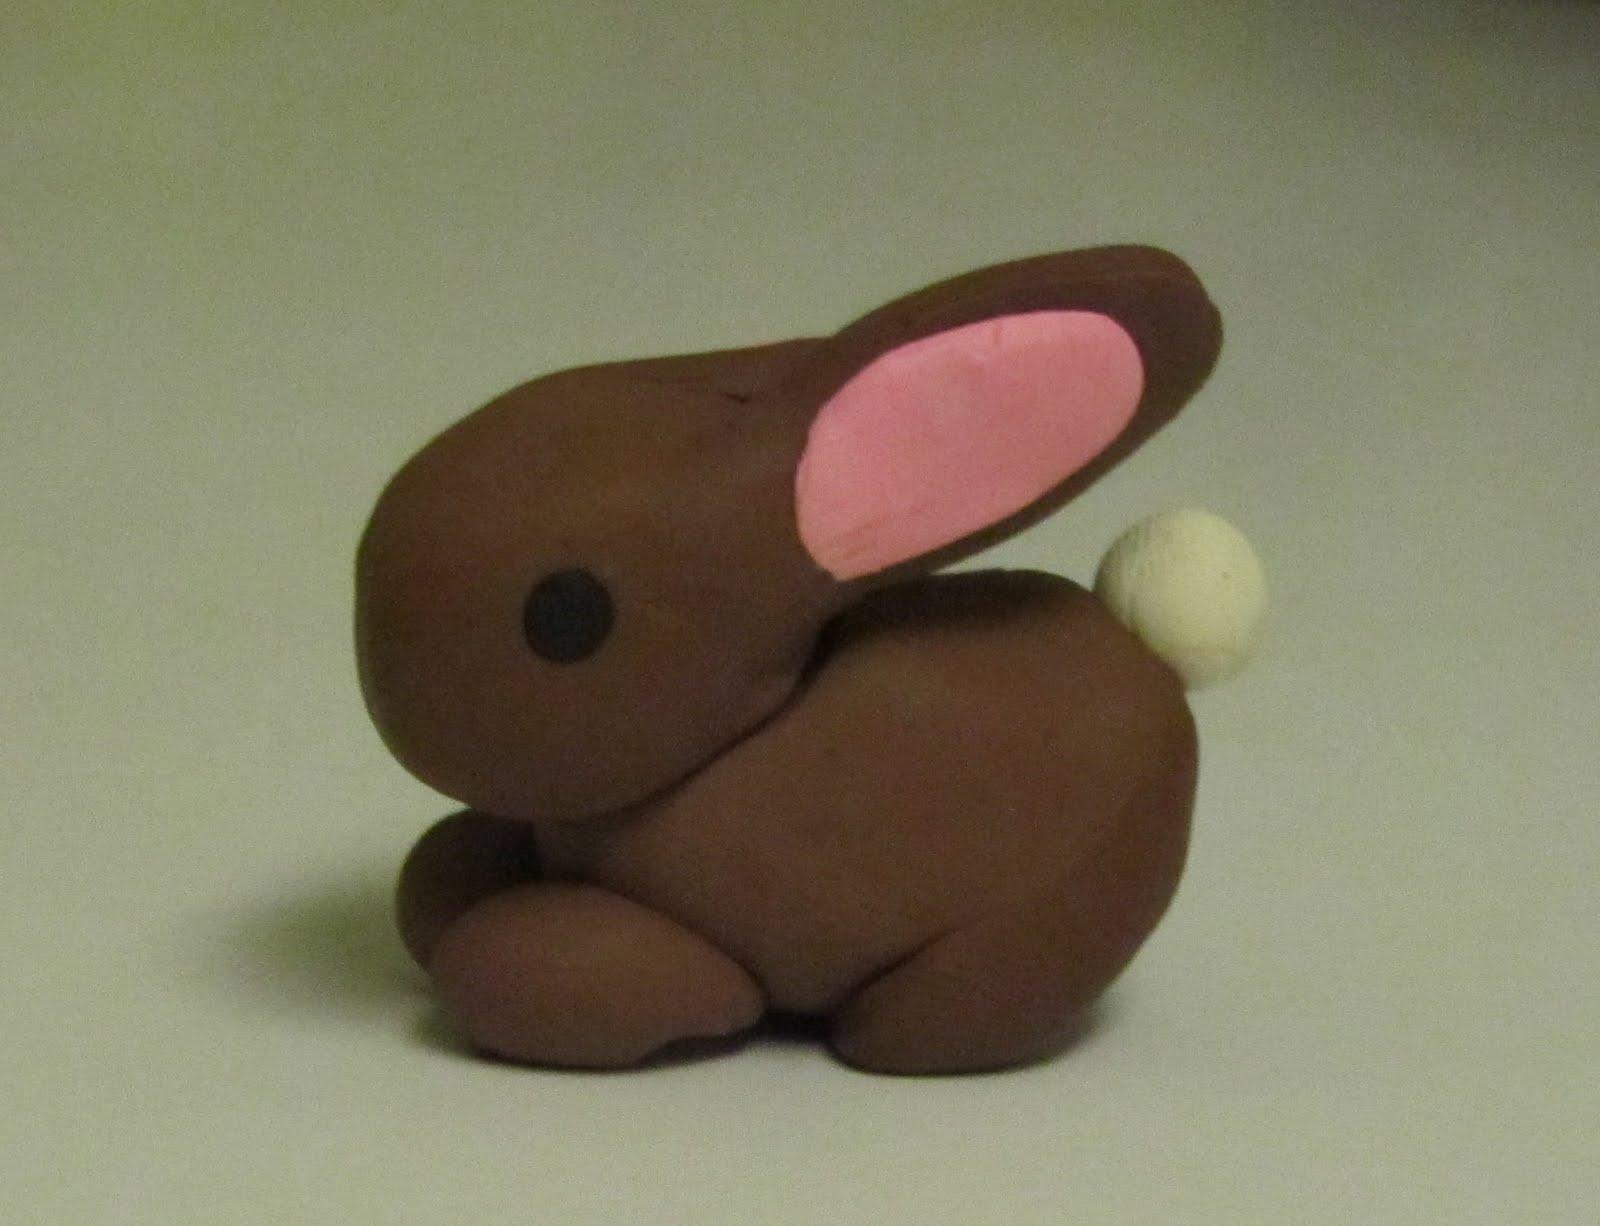 easy clay animals to make - photo #29